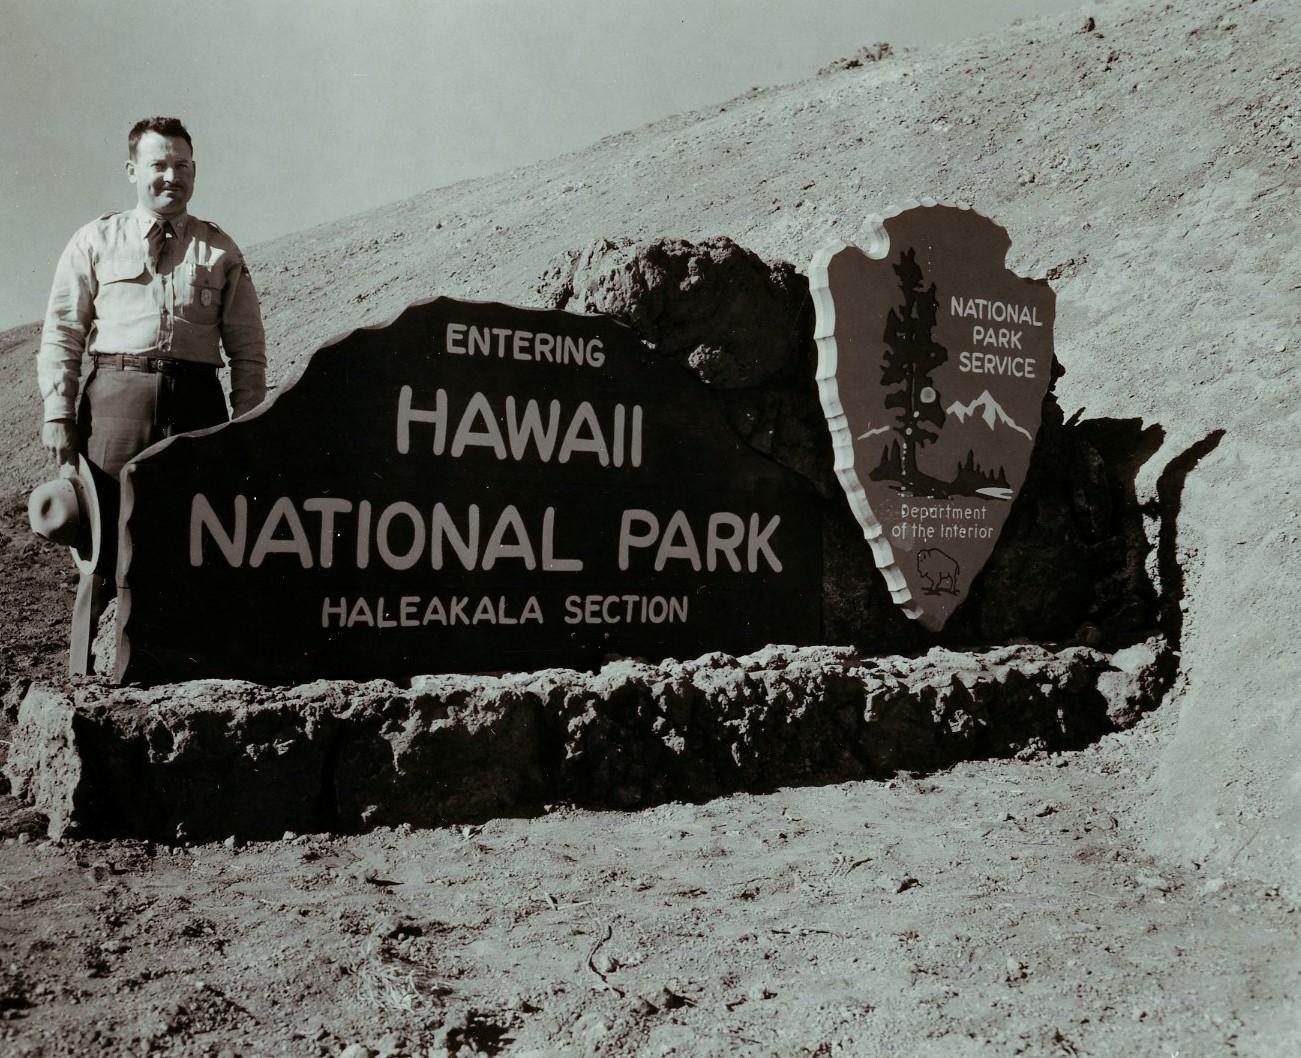 Free Entrance to Haleakalā & Hawaiʻi Volcanoes parks Aug. 1 for 105th Birthdays